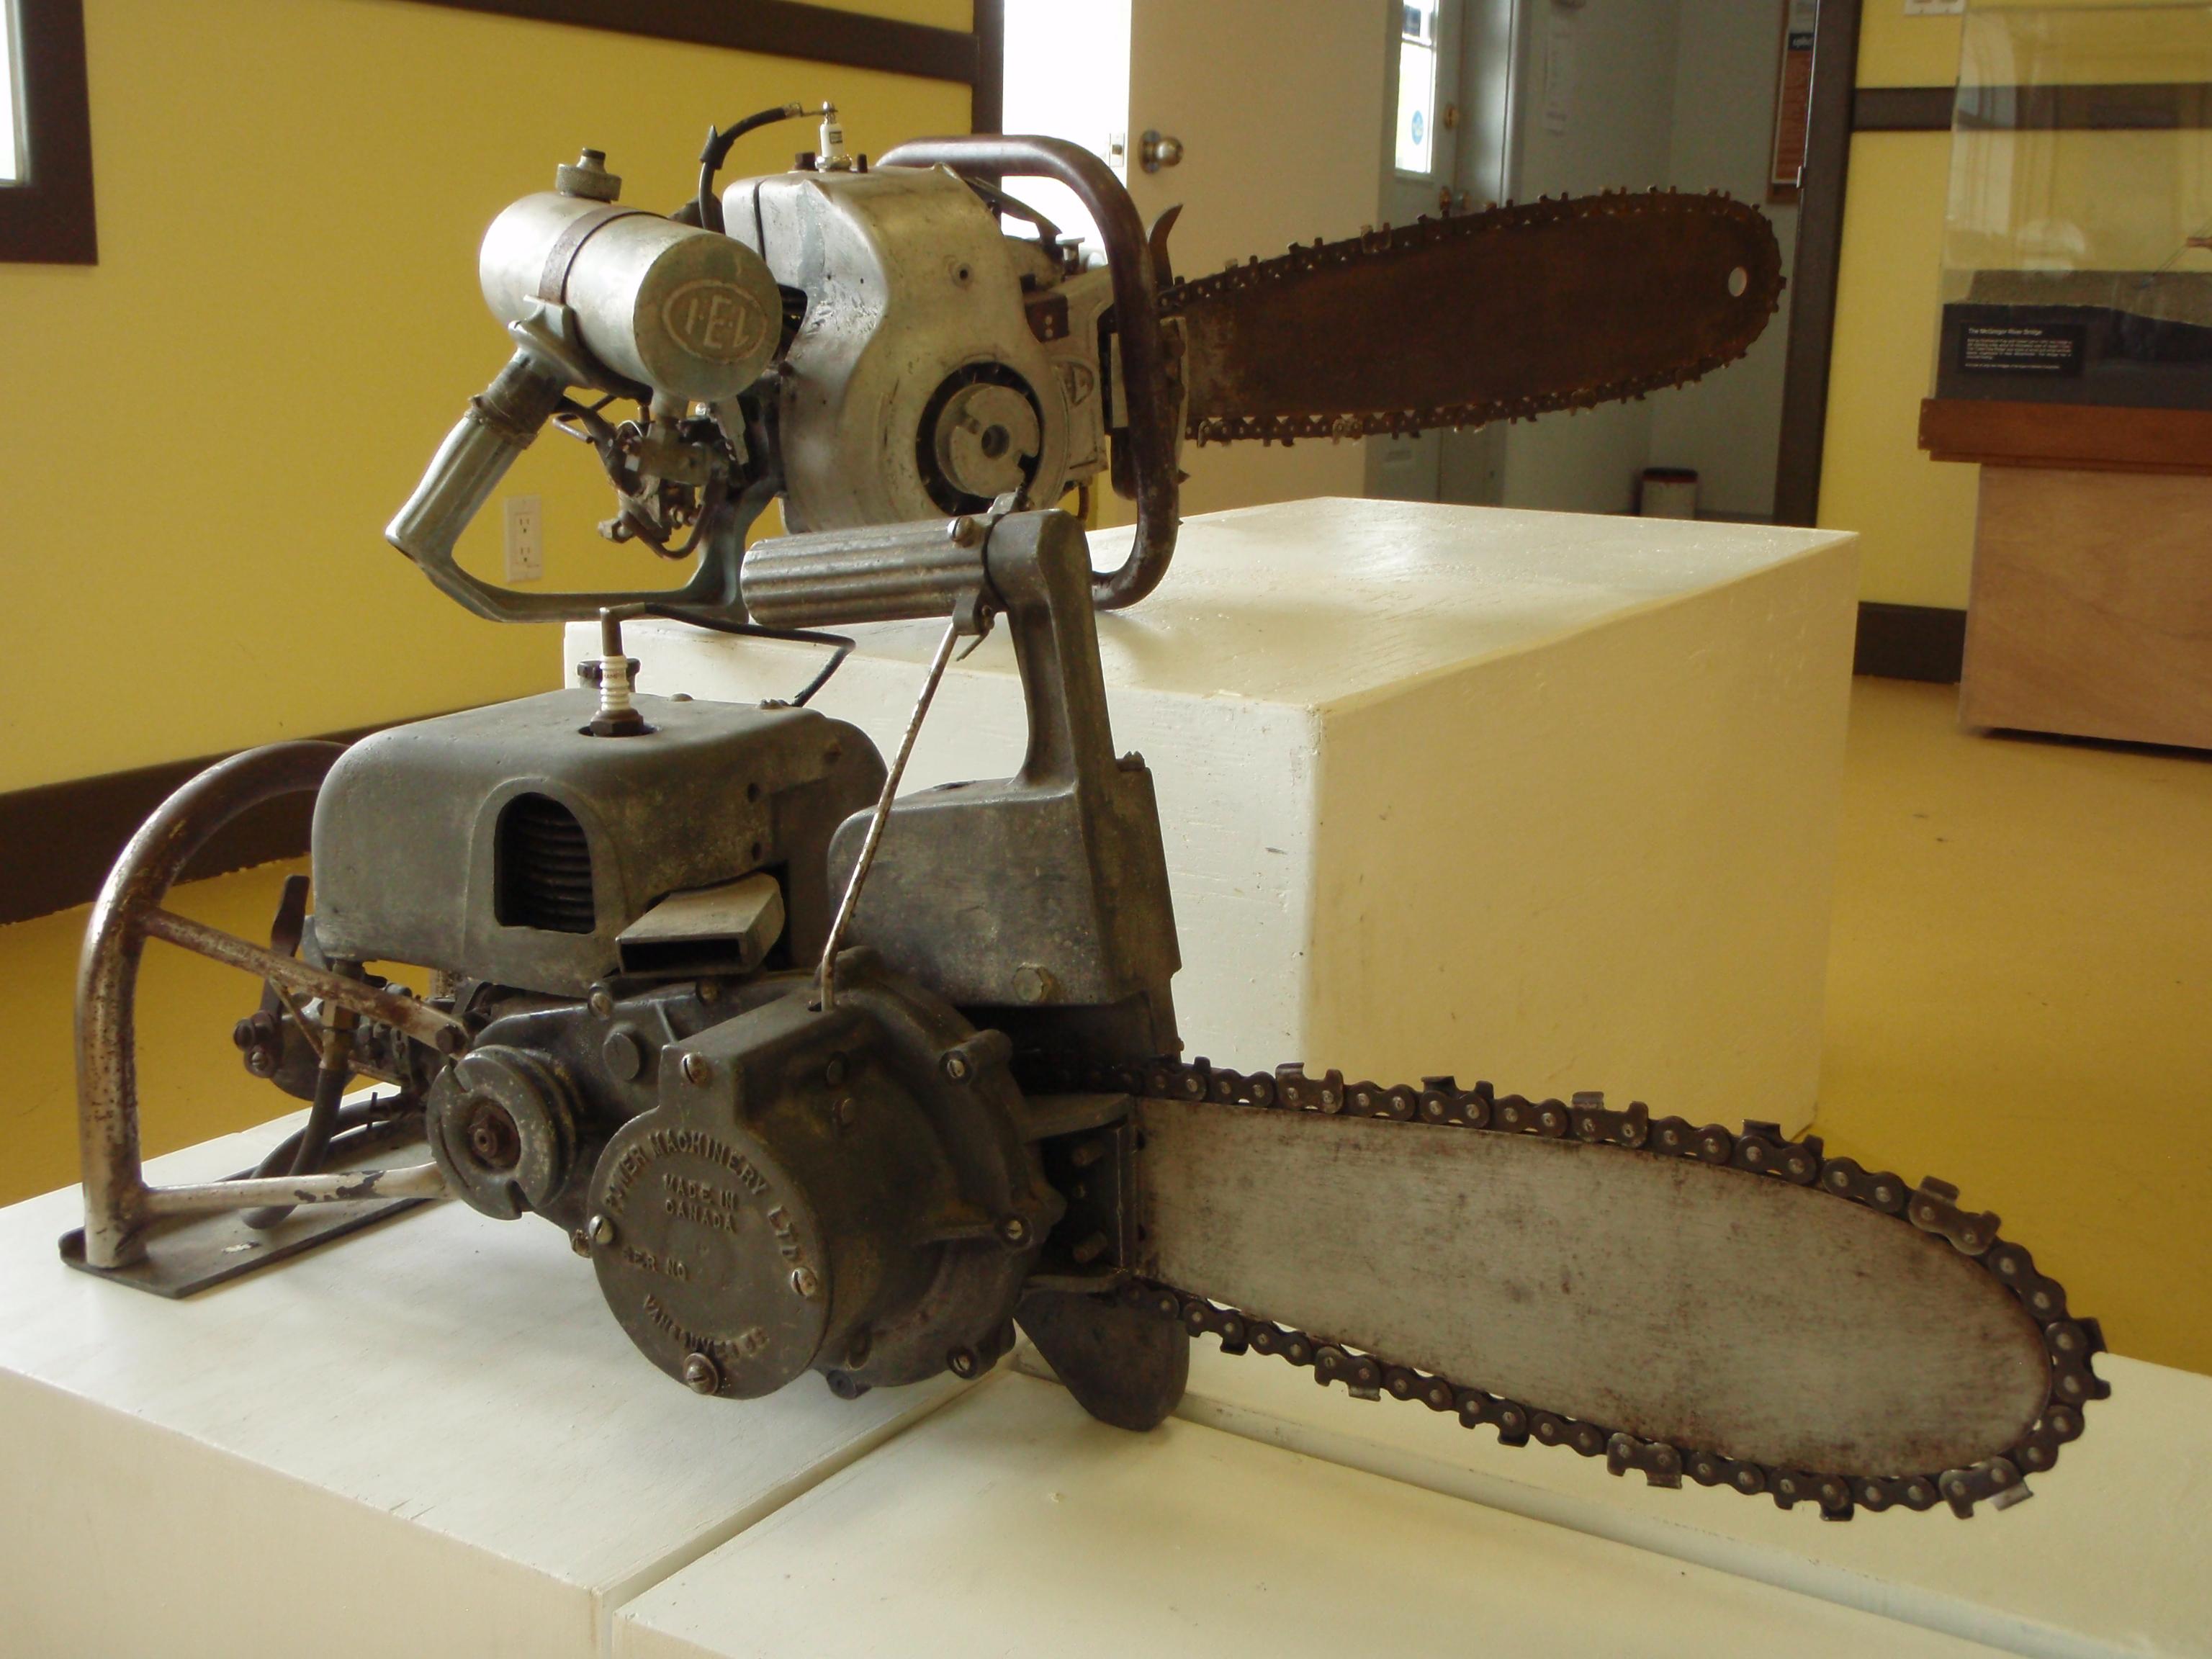 Vintage Chainsaws For Sale Kitchener